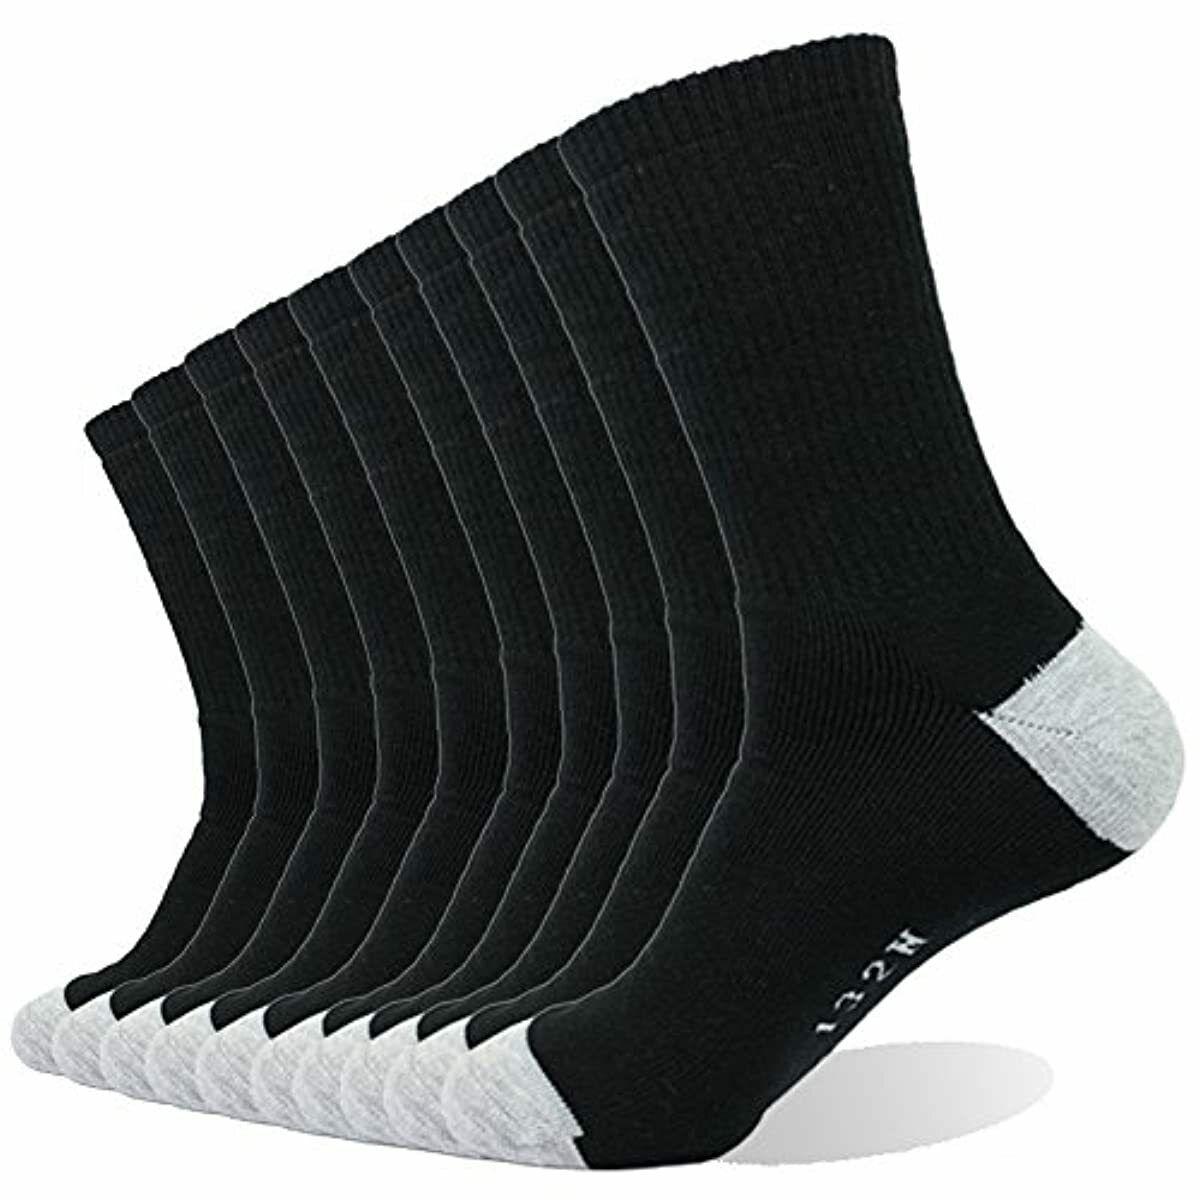 Enerwear 10P Pack Mens Cotton Moisture Wicking Extra Heavy C